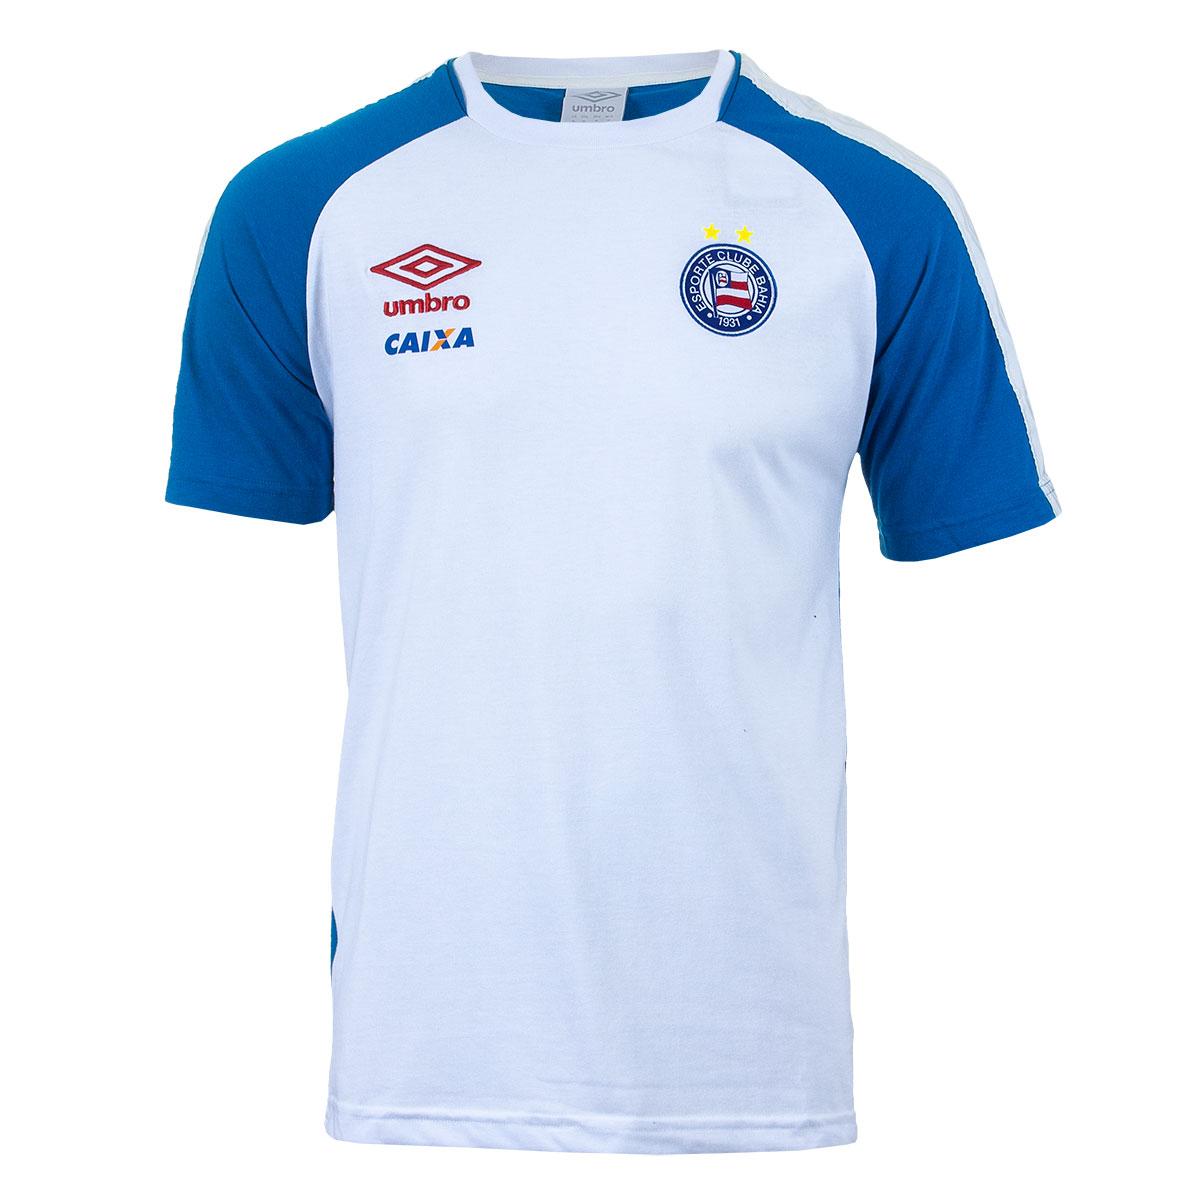 Camiseta Masc. Umbro Bahia Concentracao 2017 Futebol - Branco/Azul